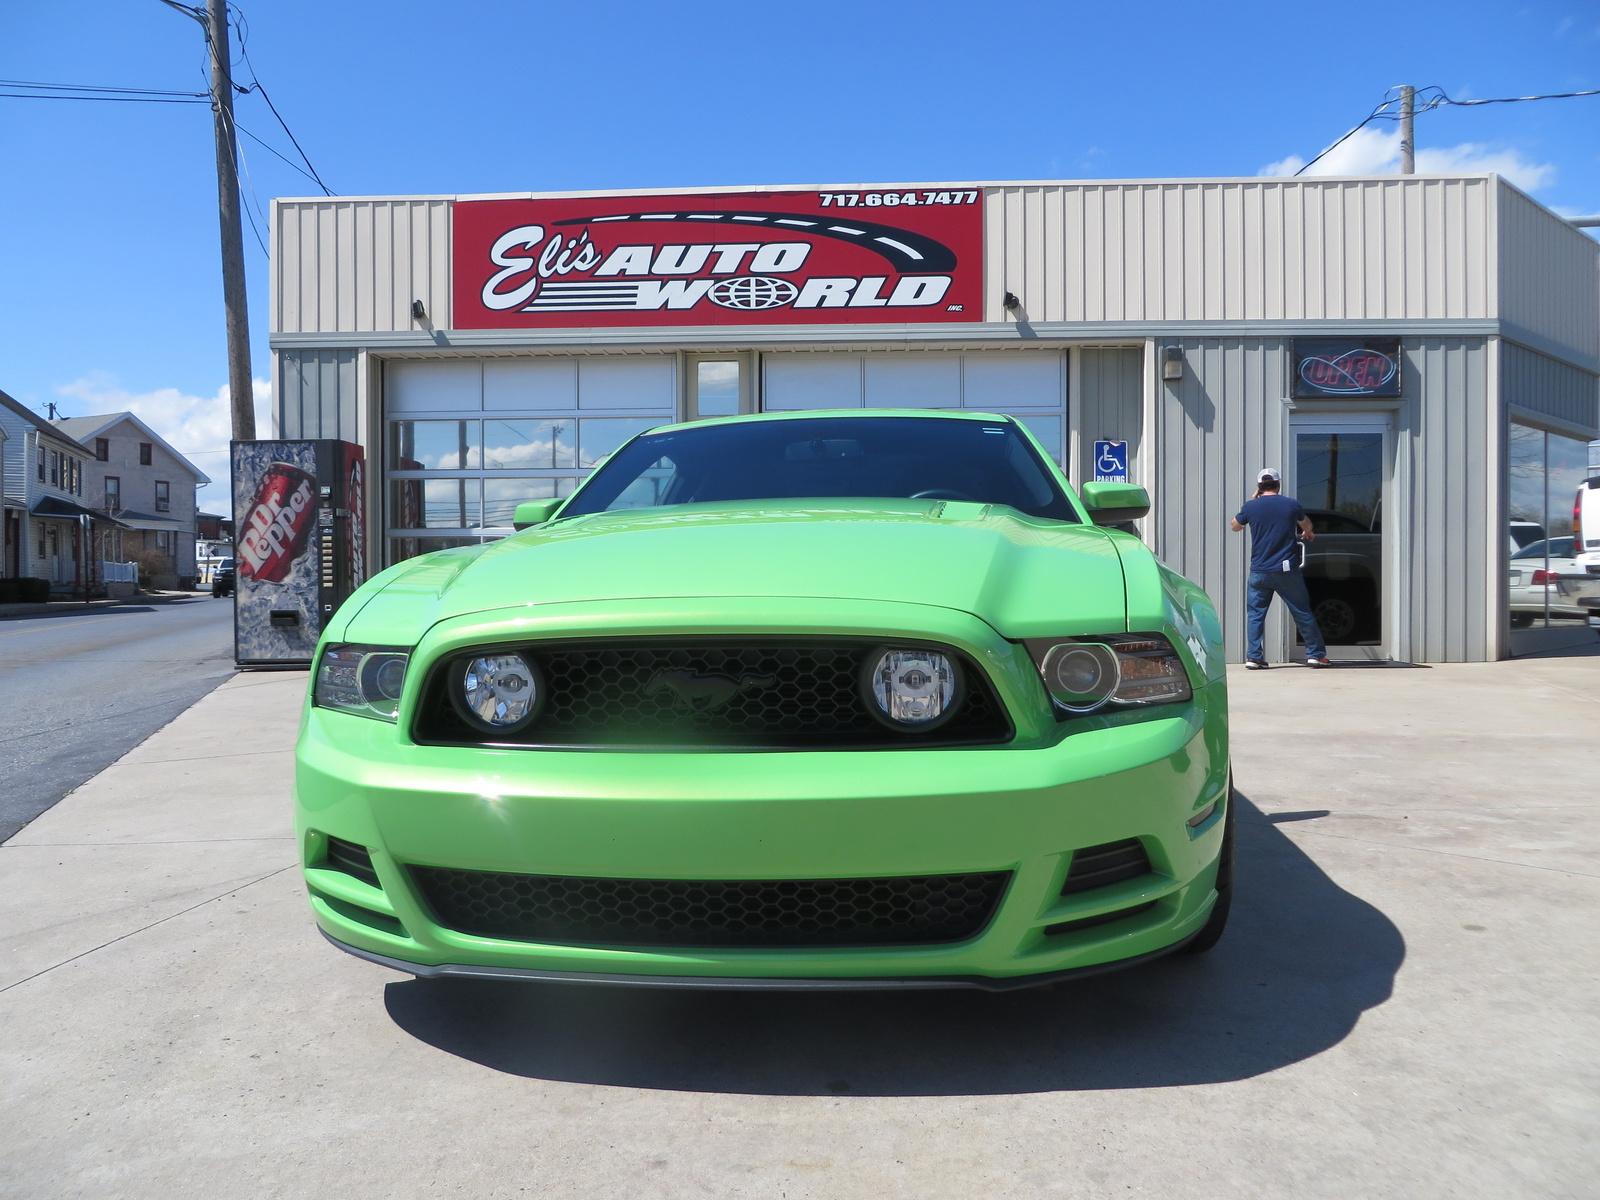 Lexus Dealers In Pa >> Eli's Auto World - Manheim, PA: Read Consumer reviews ...